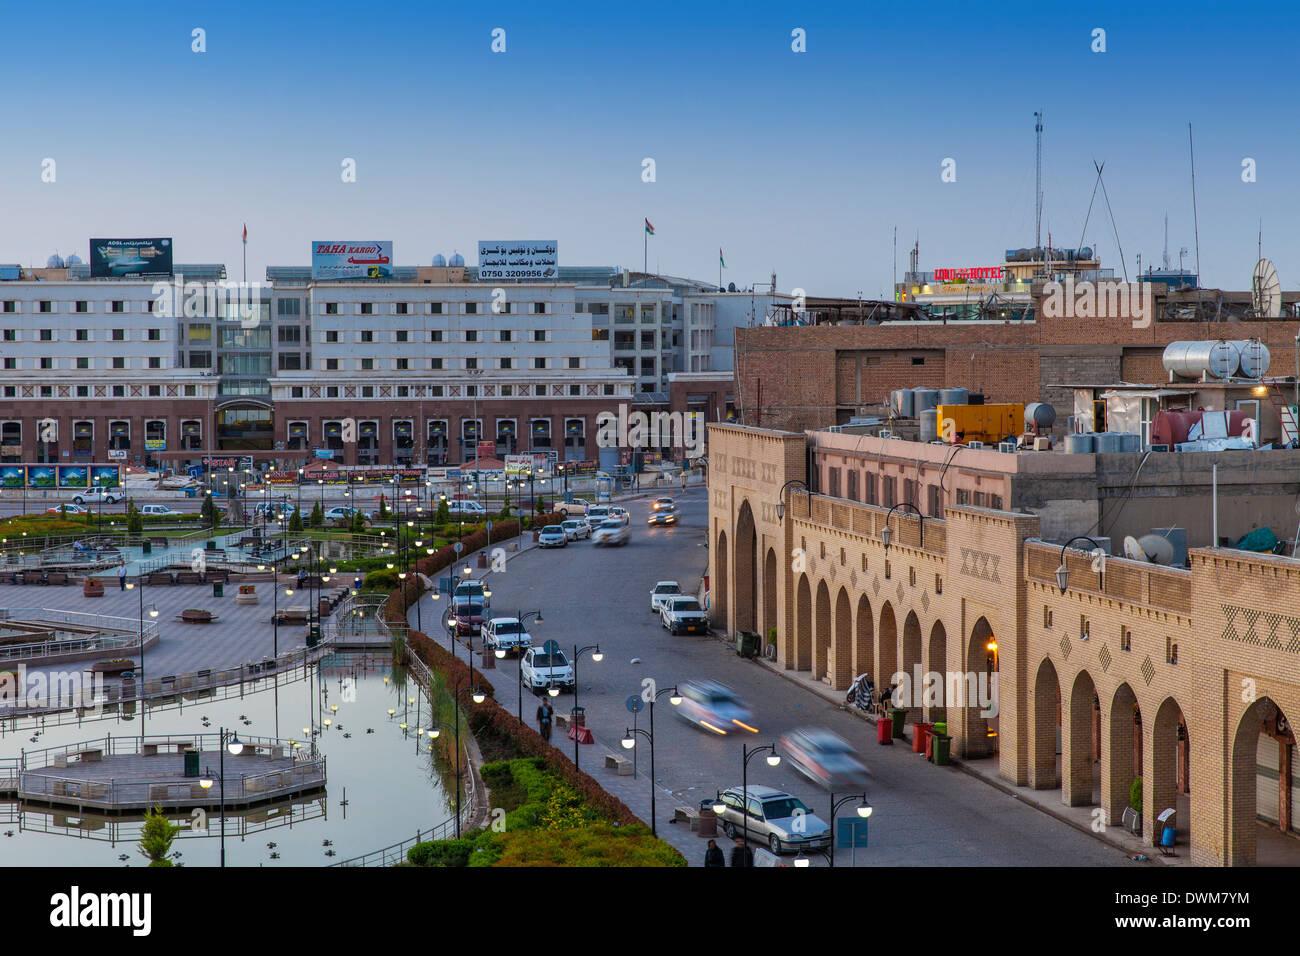 Shar Park and Qaysari Bazaars, Erbil, Kurdistan, Iraq, Middle East - Stock Image